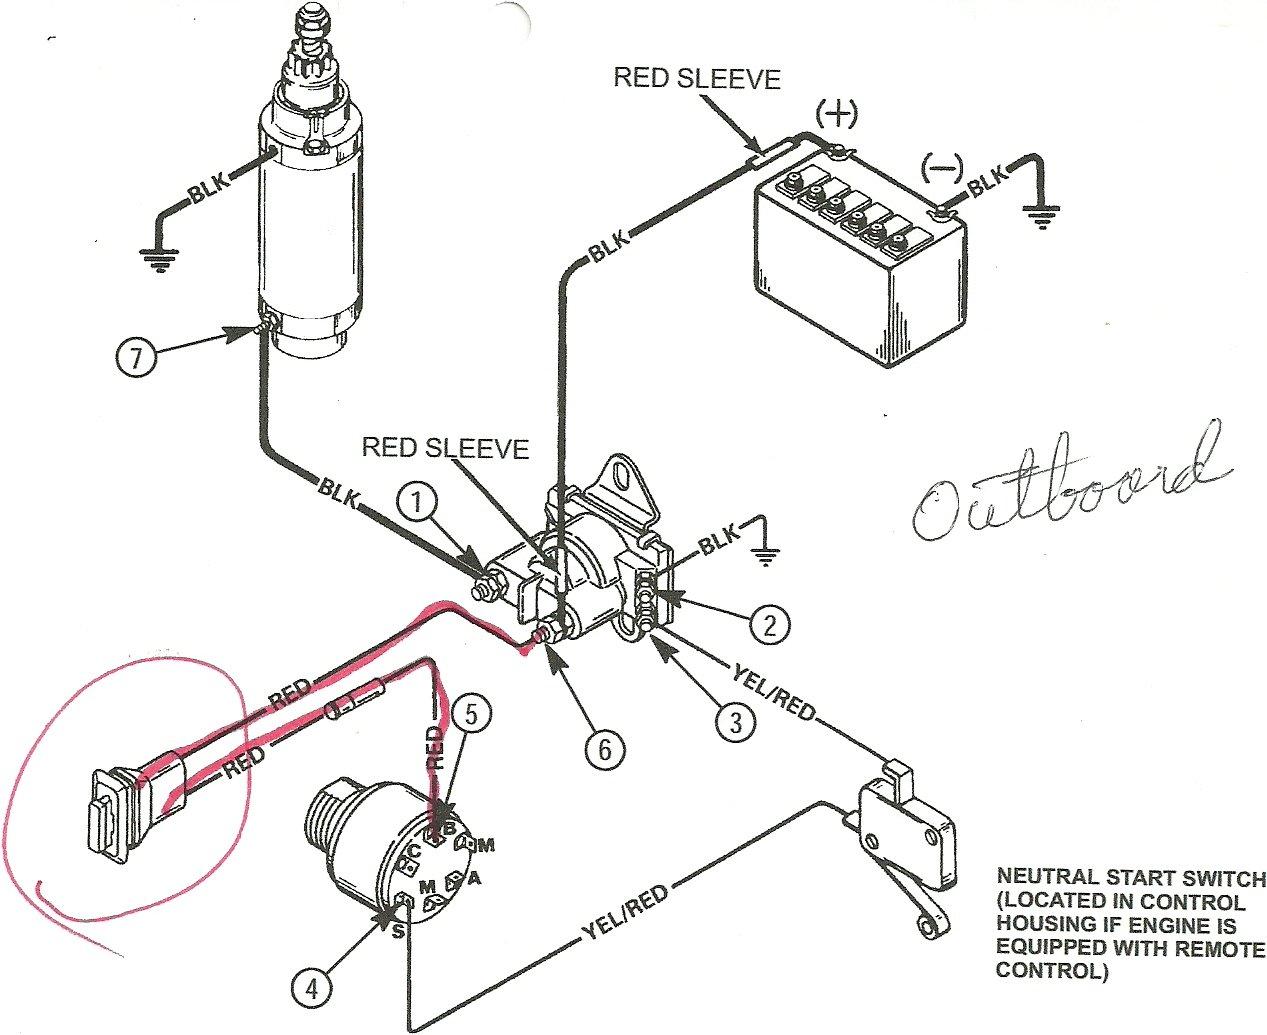 Suzuki Gsx R600 Srad Motorcycle 1998 additionally 4tt46 Stroke 25 Hp Merc 2006 Elec Start Just Clicks moreover 1956 Chevy Steering Column Wiring Diagram furthermore Showthread moreover Ford Thunderbird 1958 Windows Wiring. on 1956 chevy turn signal switch wiring diagram